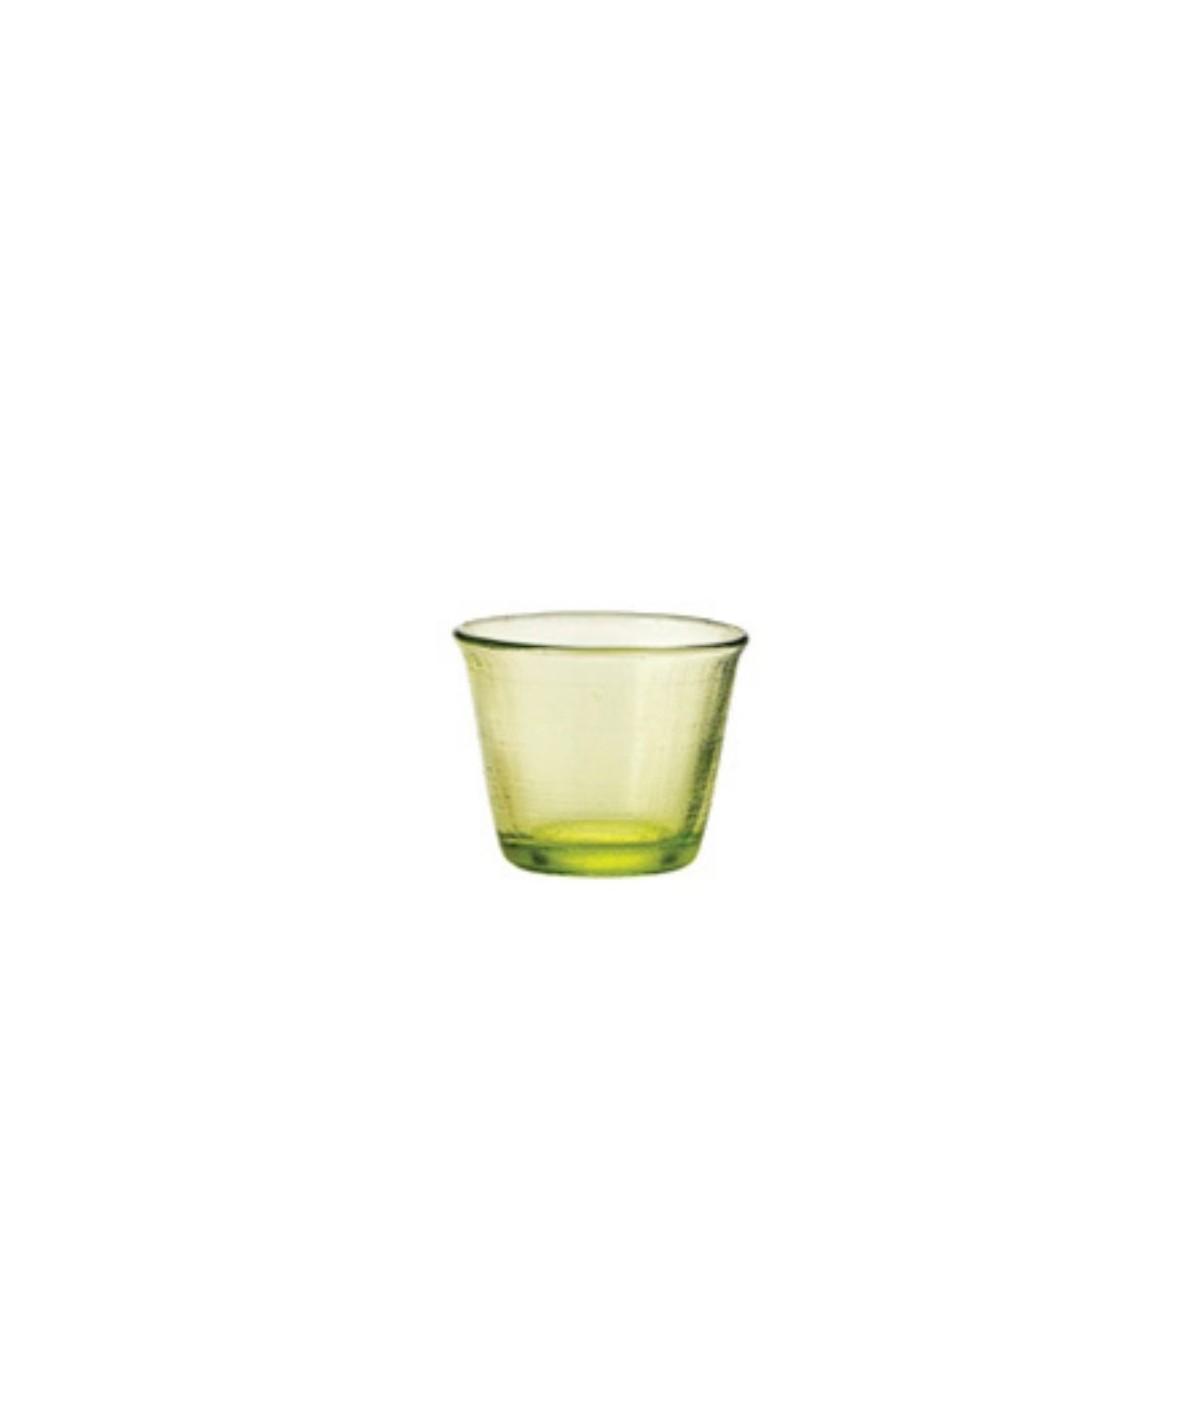 Bicchiere verde in vetro Denim set 6 pezzi - Every Day